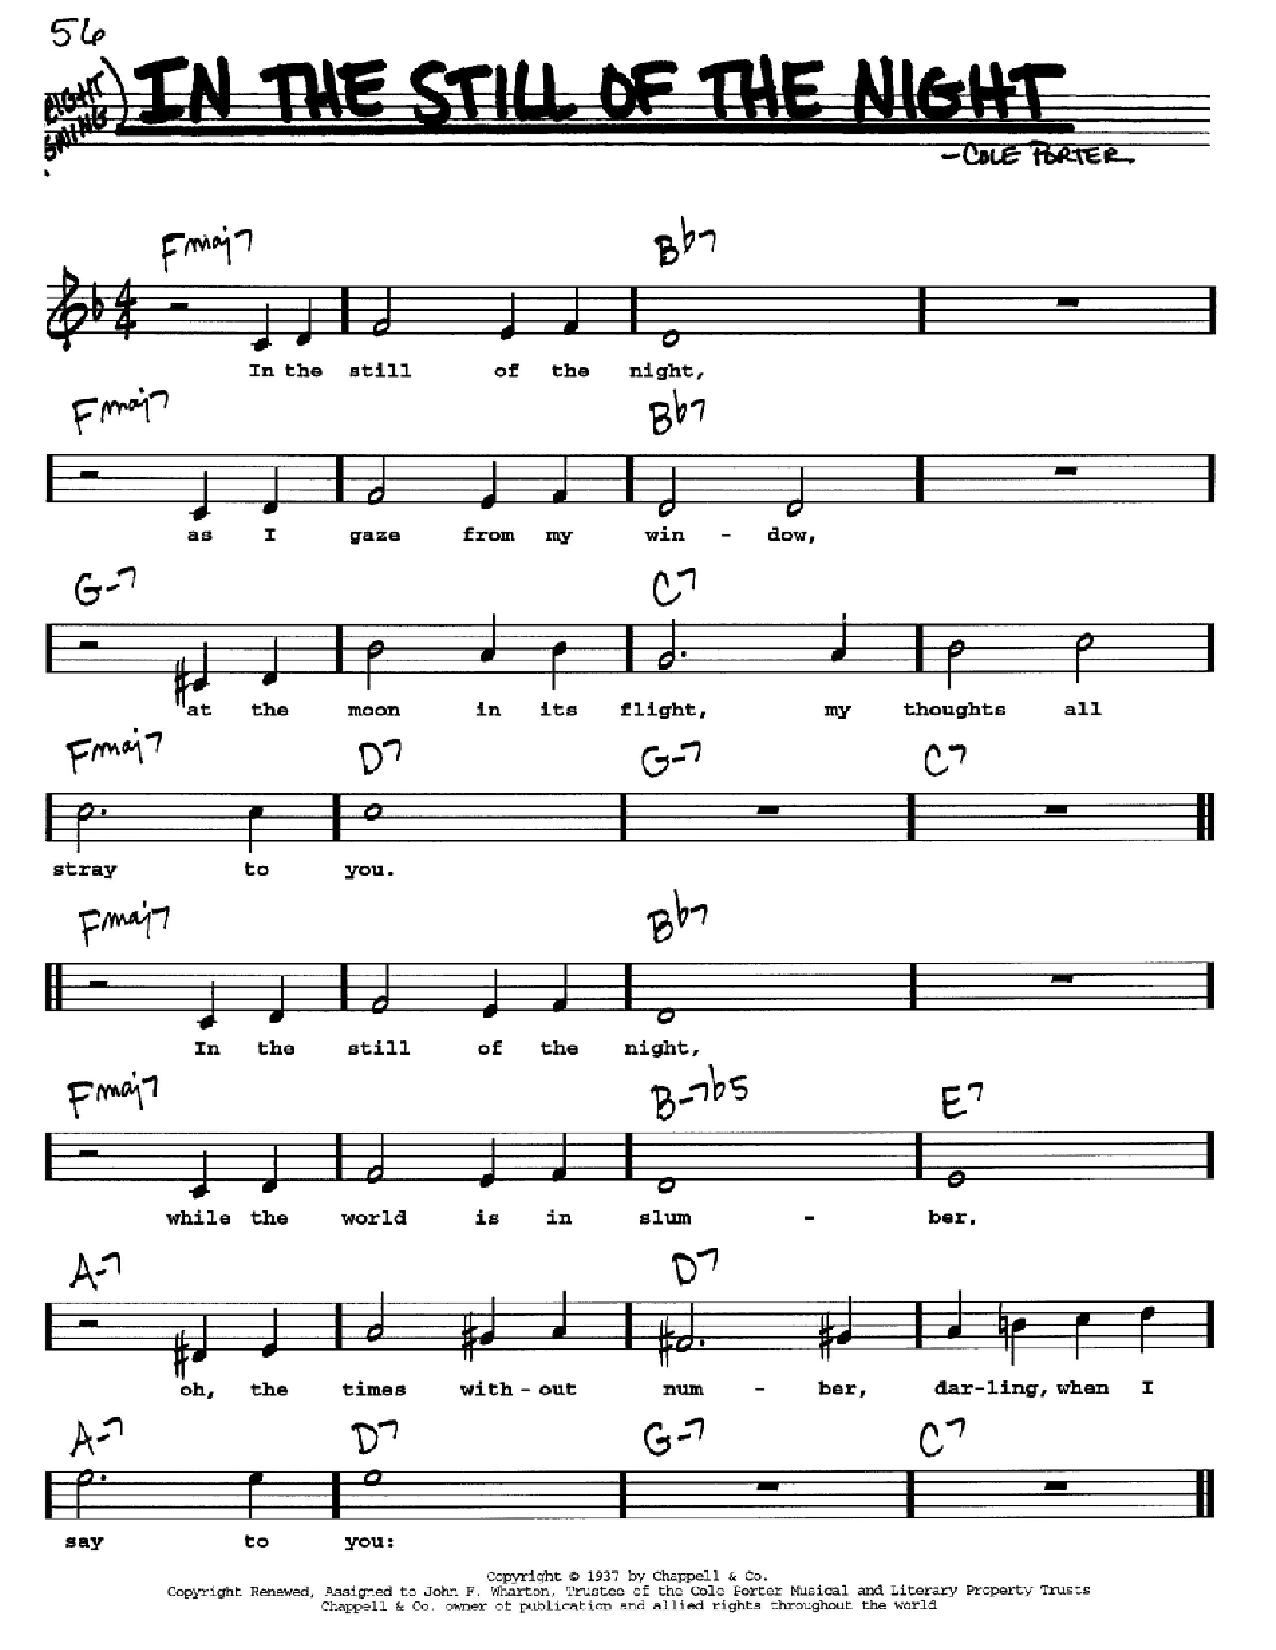 Partition autre In The Still Of The Night de Cole Porter - Real Book, Melodie, Paroles et Accords, Inst. En Do